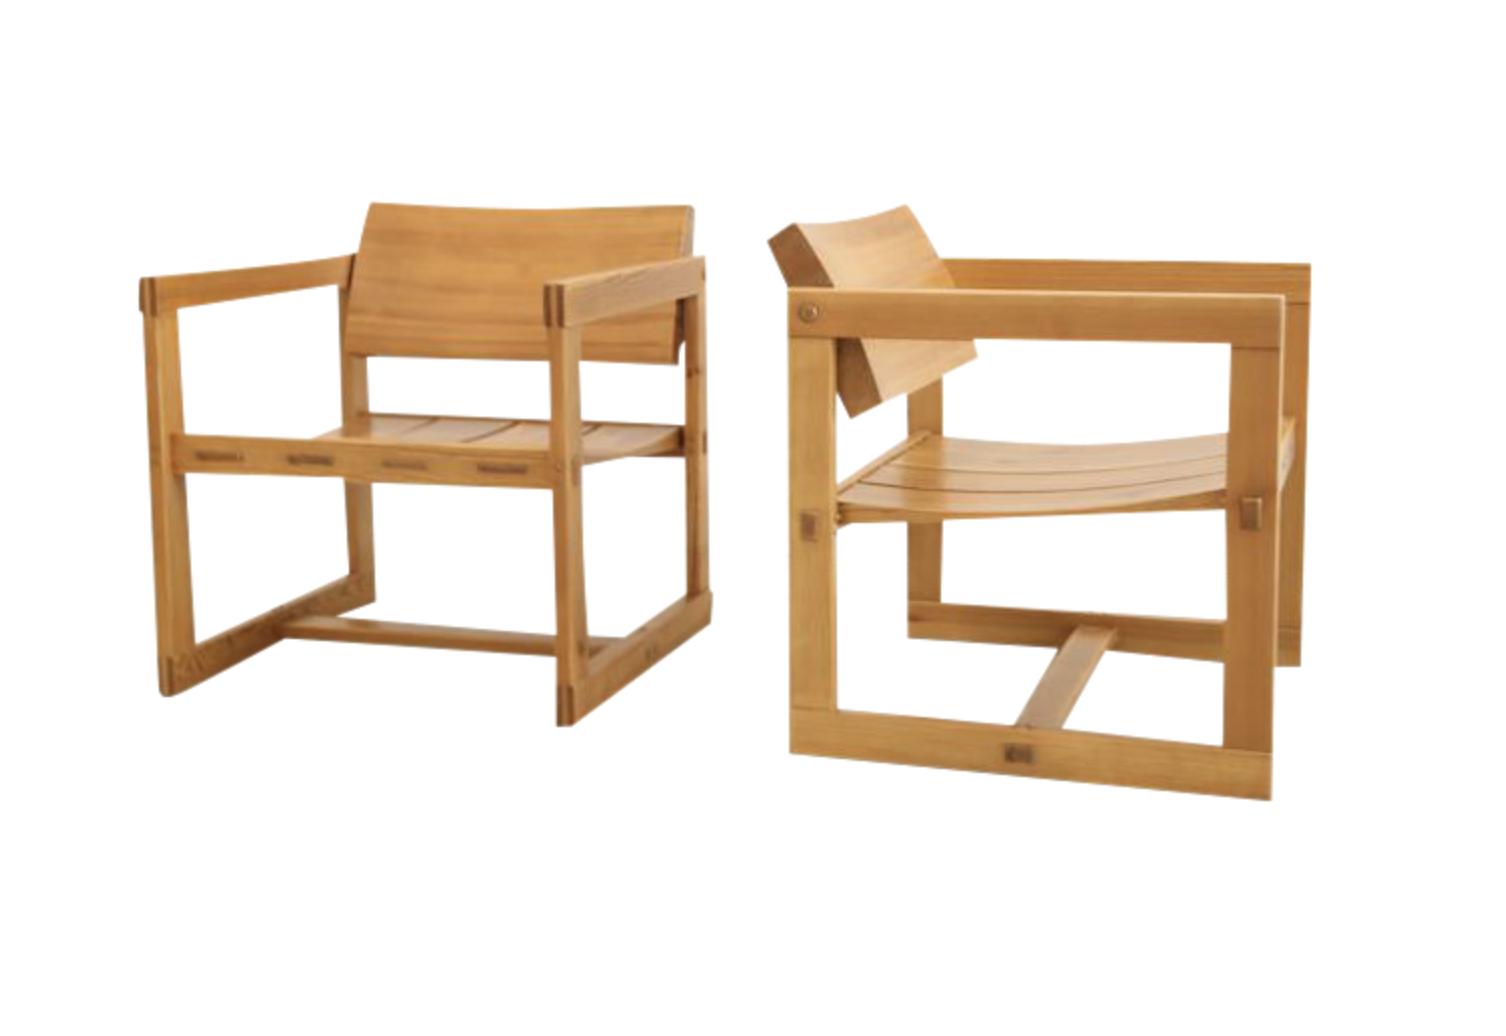 - Trybo Series Lounge Chairs, 1960sEdvin HelsethNorway22.75